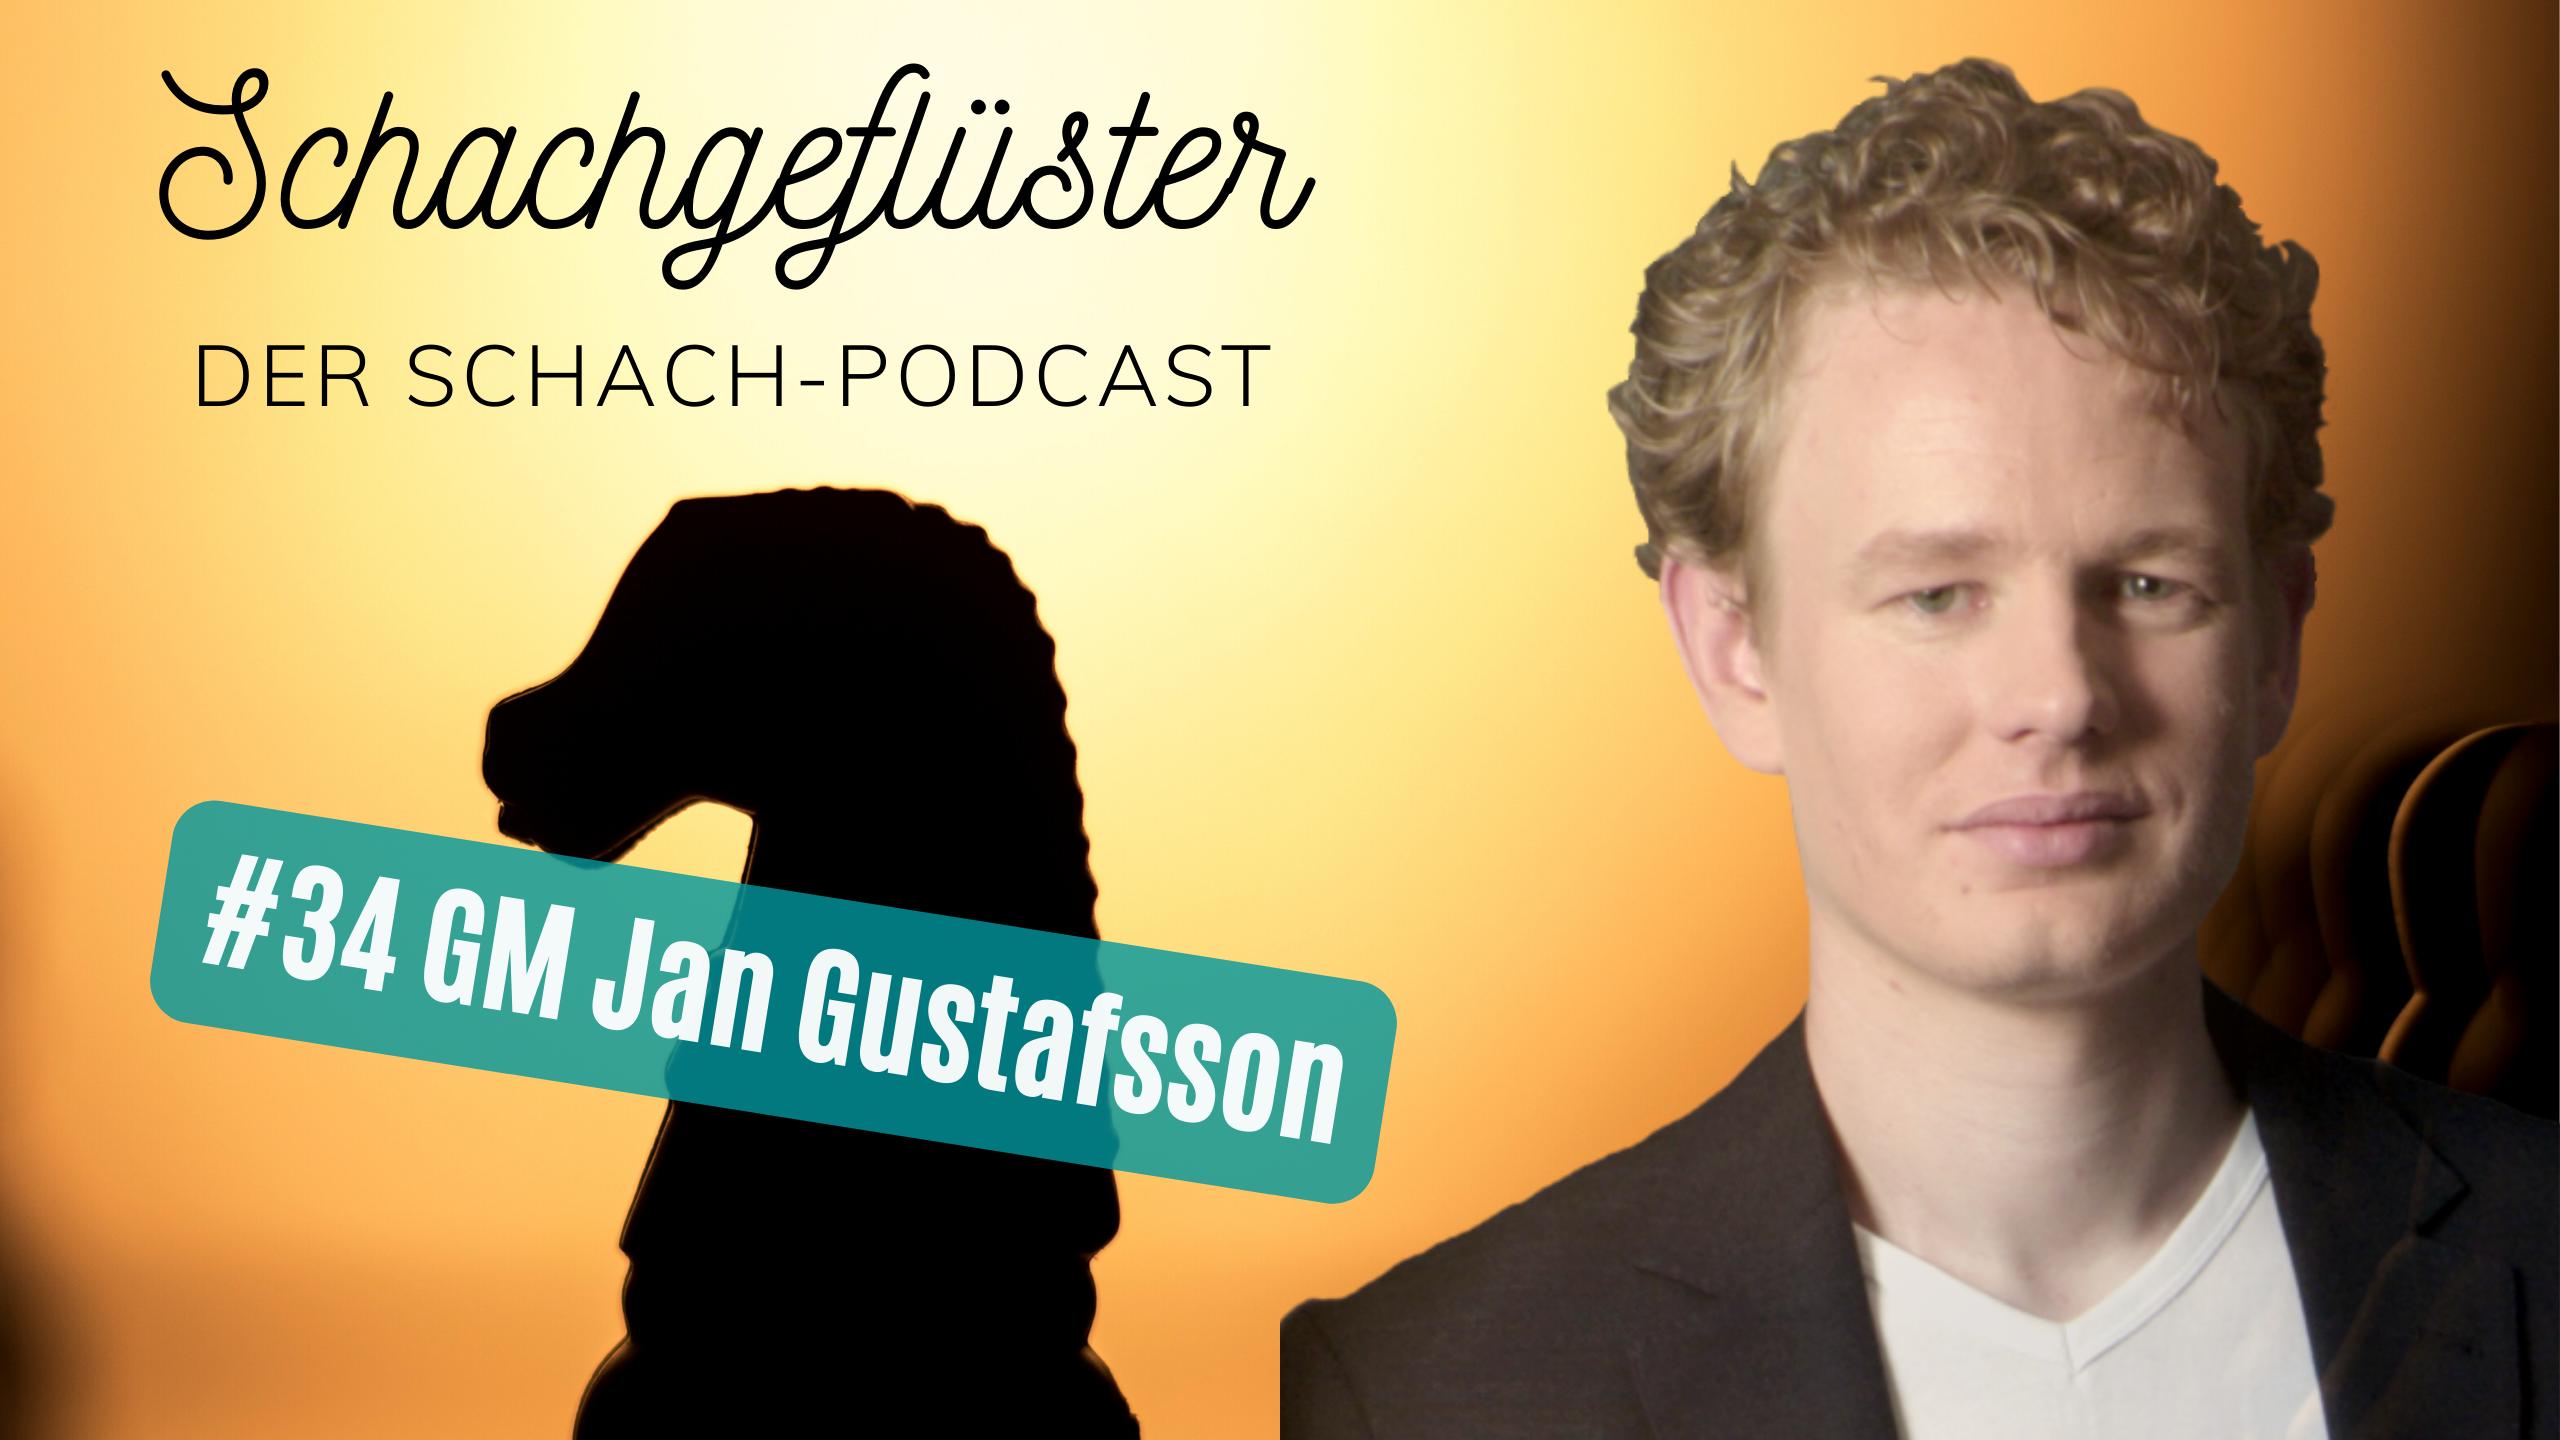 chess 24 - Jan Gustafsson